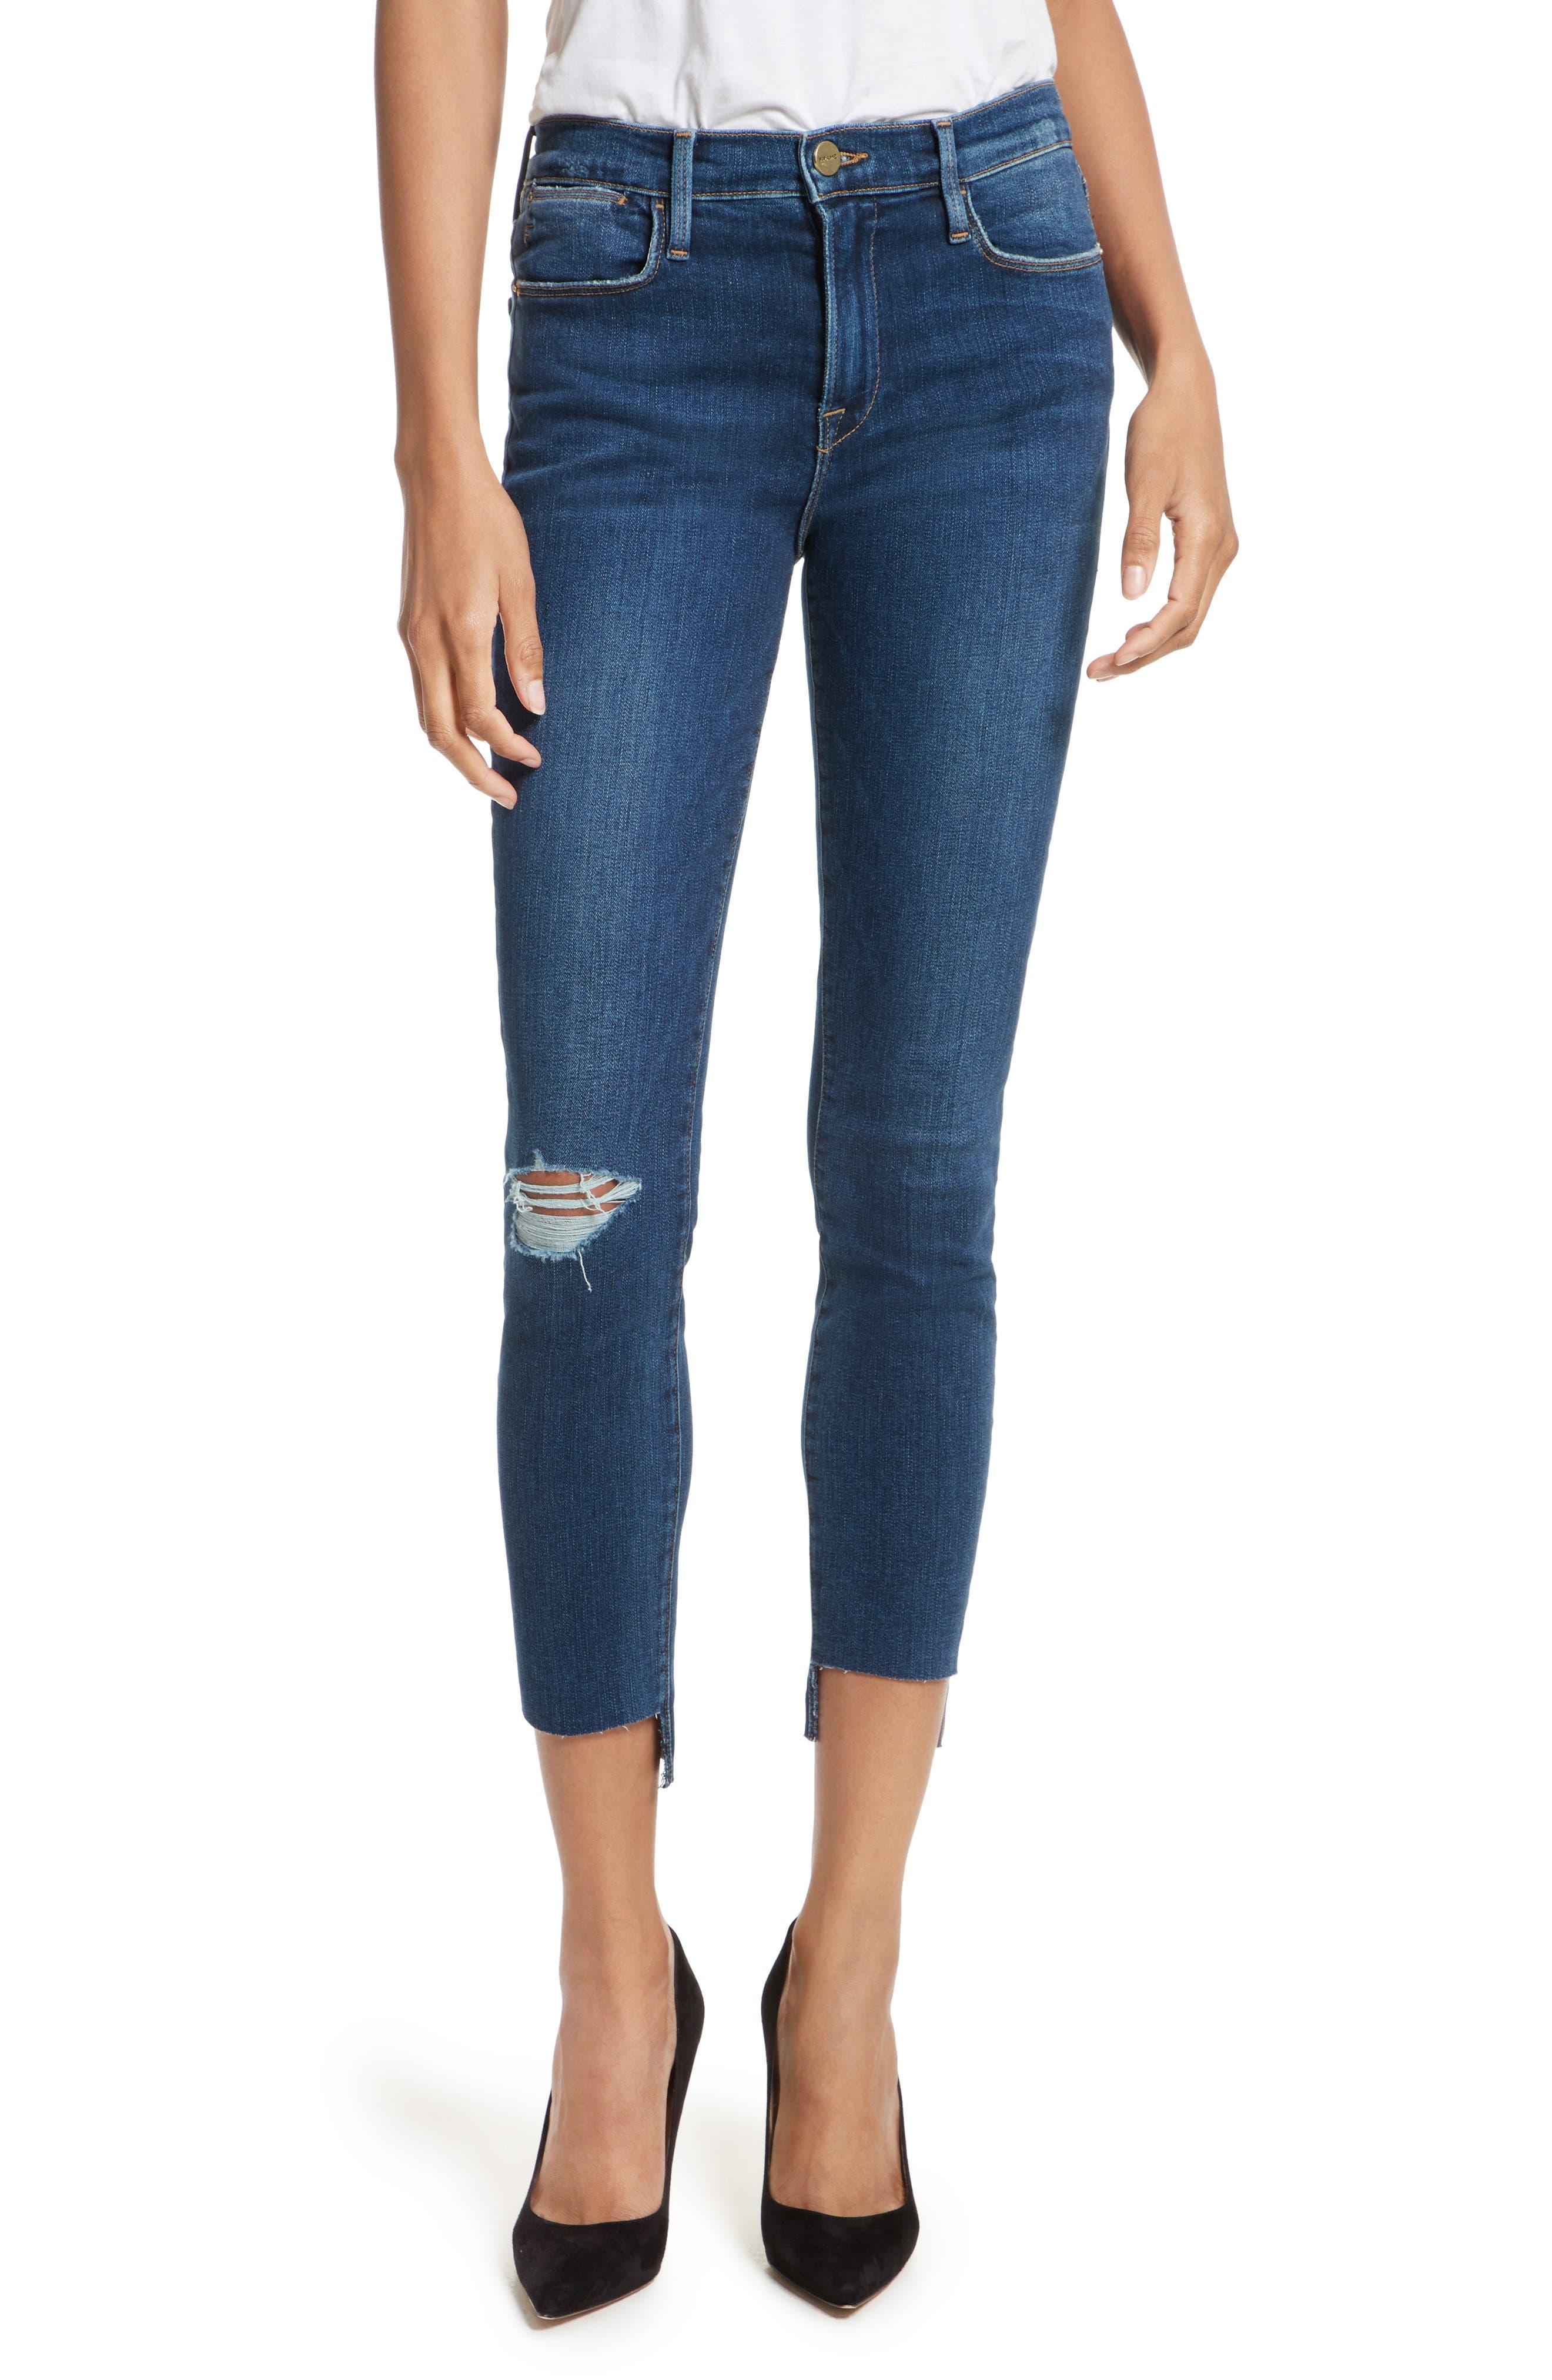 Alternate Image 1 Selected - FRAME Le High High Waist Staggered Hem Slim Jeans (Baisley)